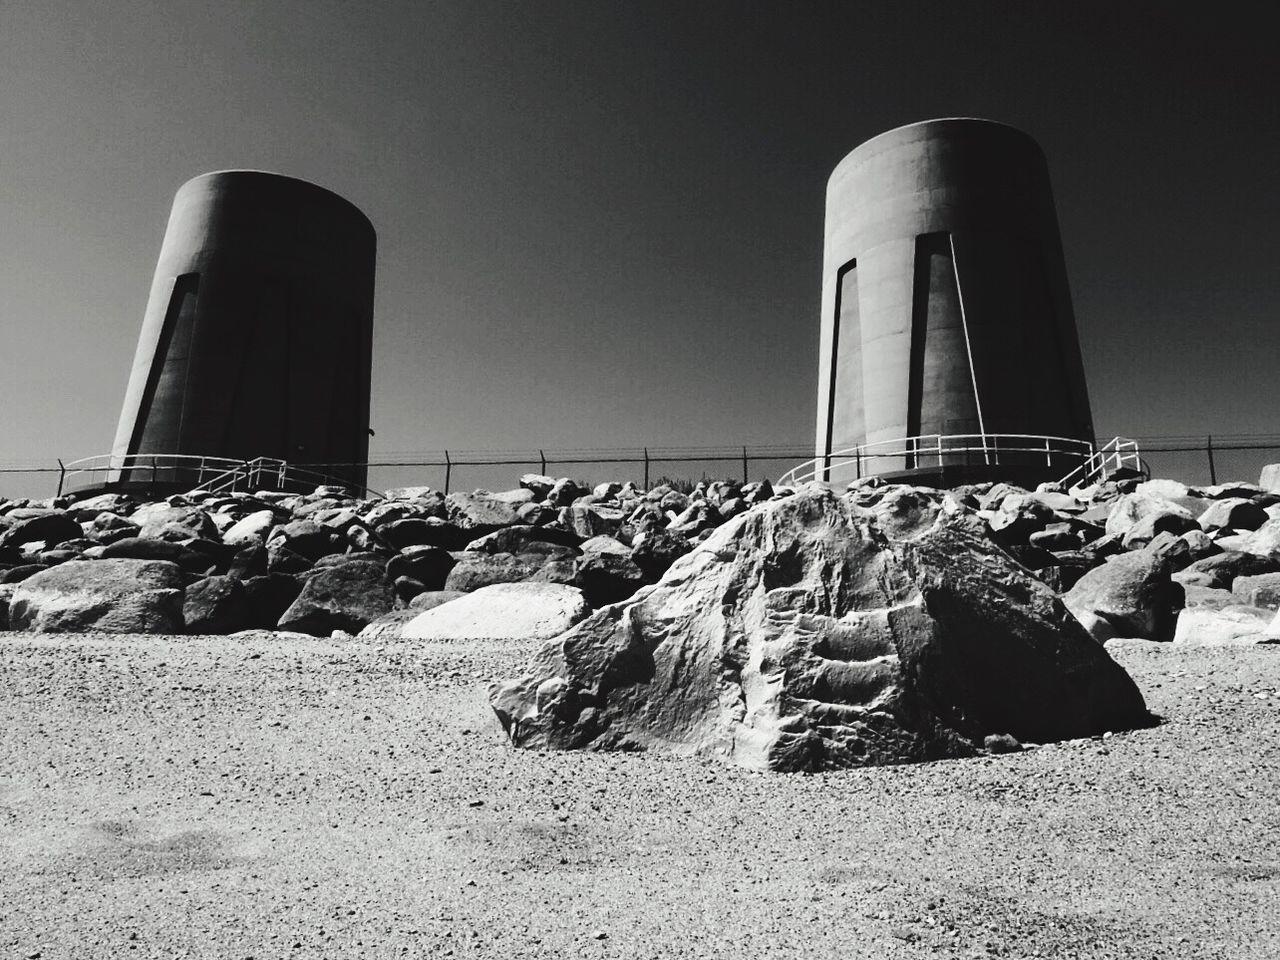 Showcase June Saskatchewan Architecture Black And White Photography Rocks Beach High Contrast Monochrome Photography